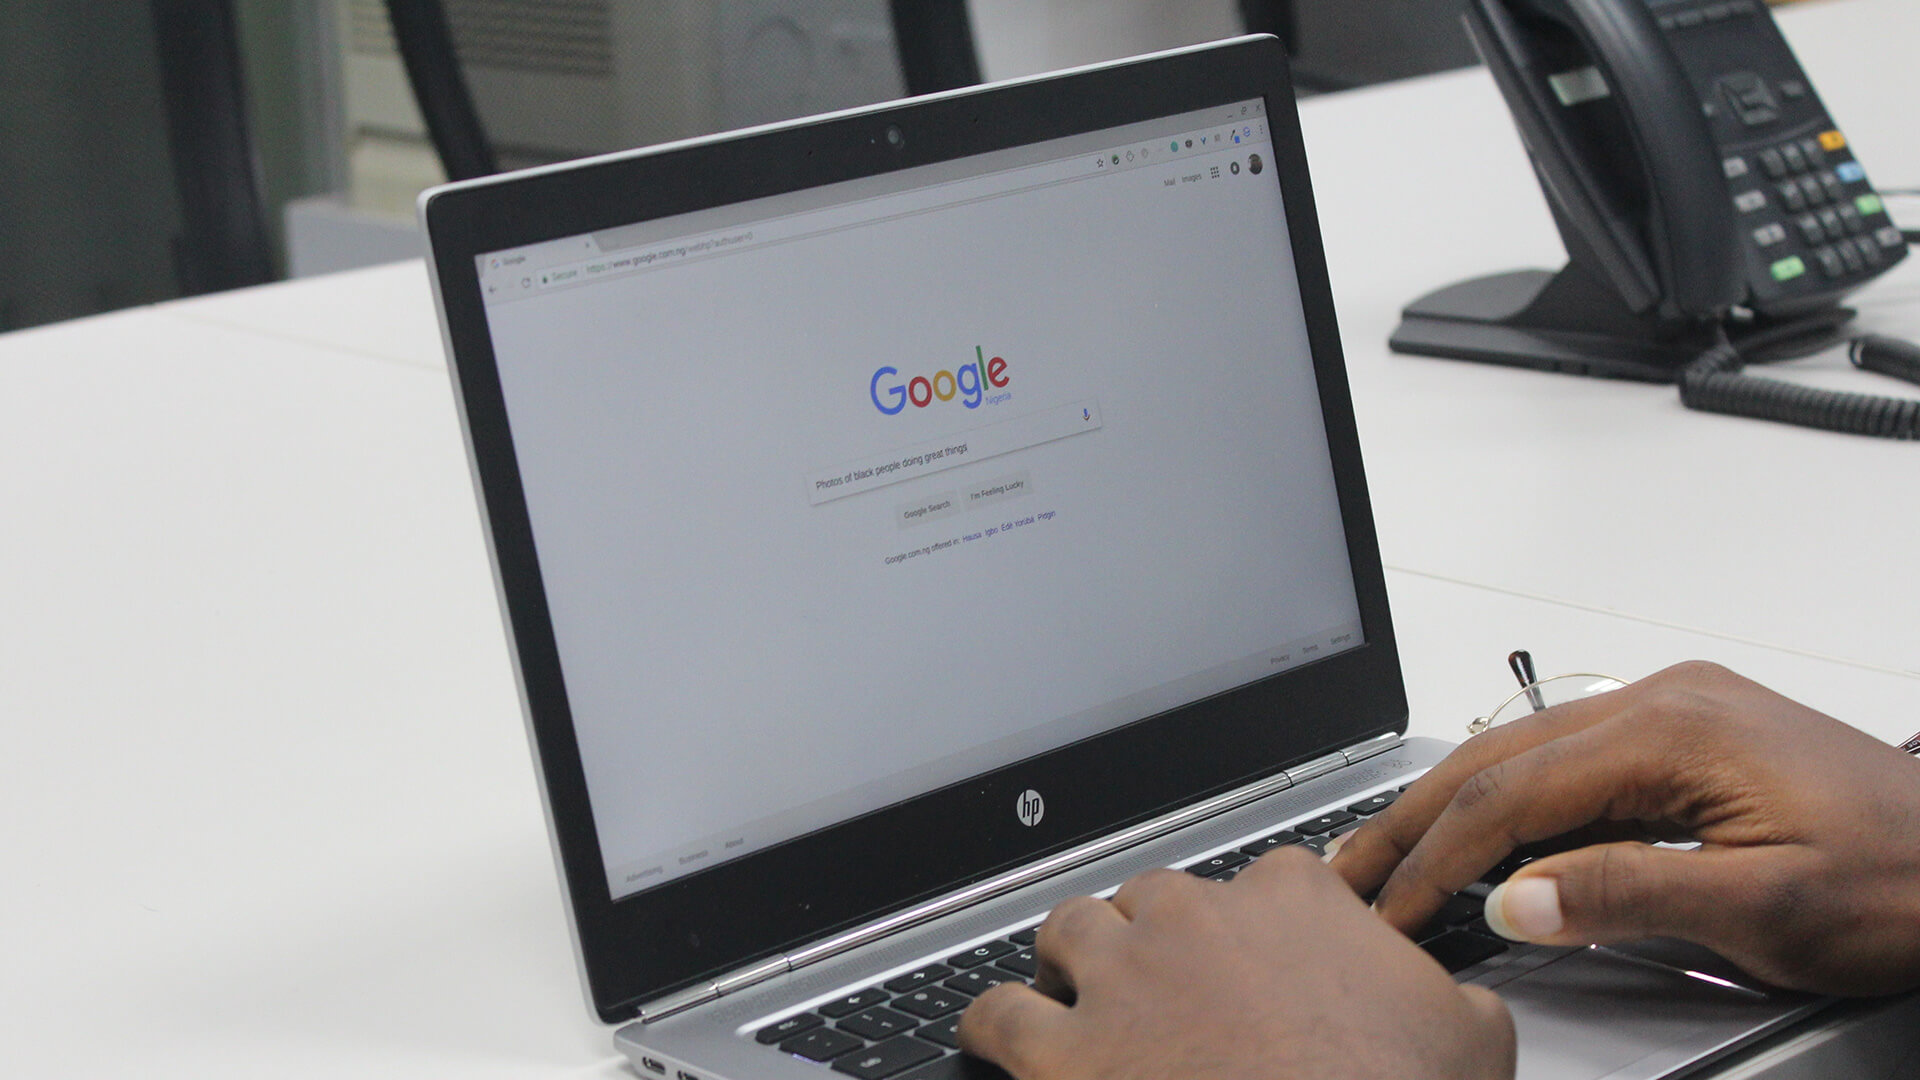 Cuánto tarda un sitio en aparecer en Google